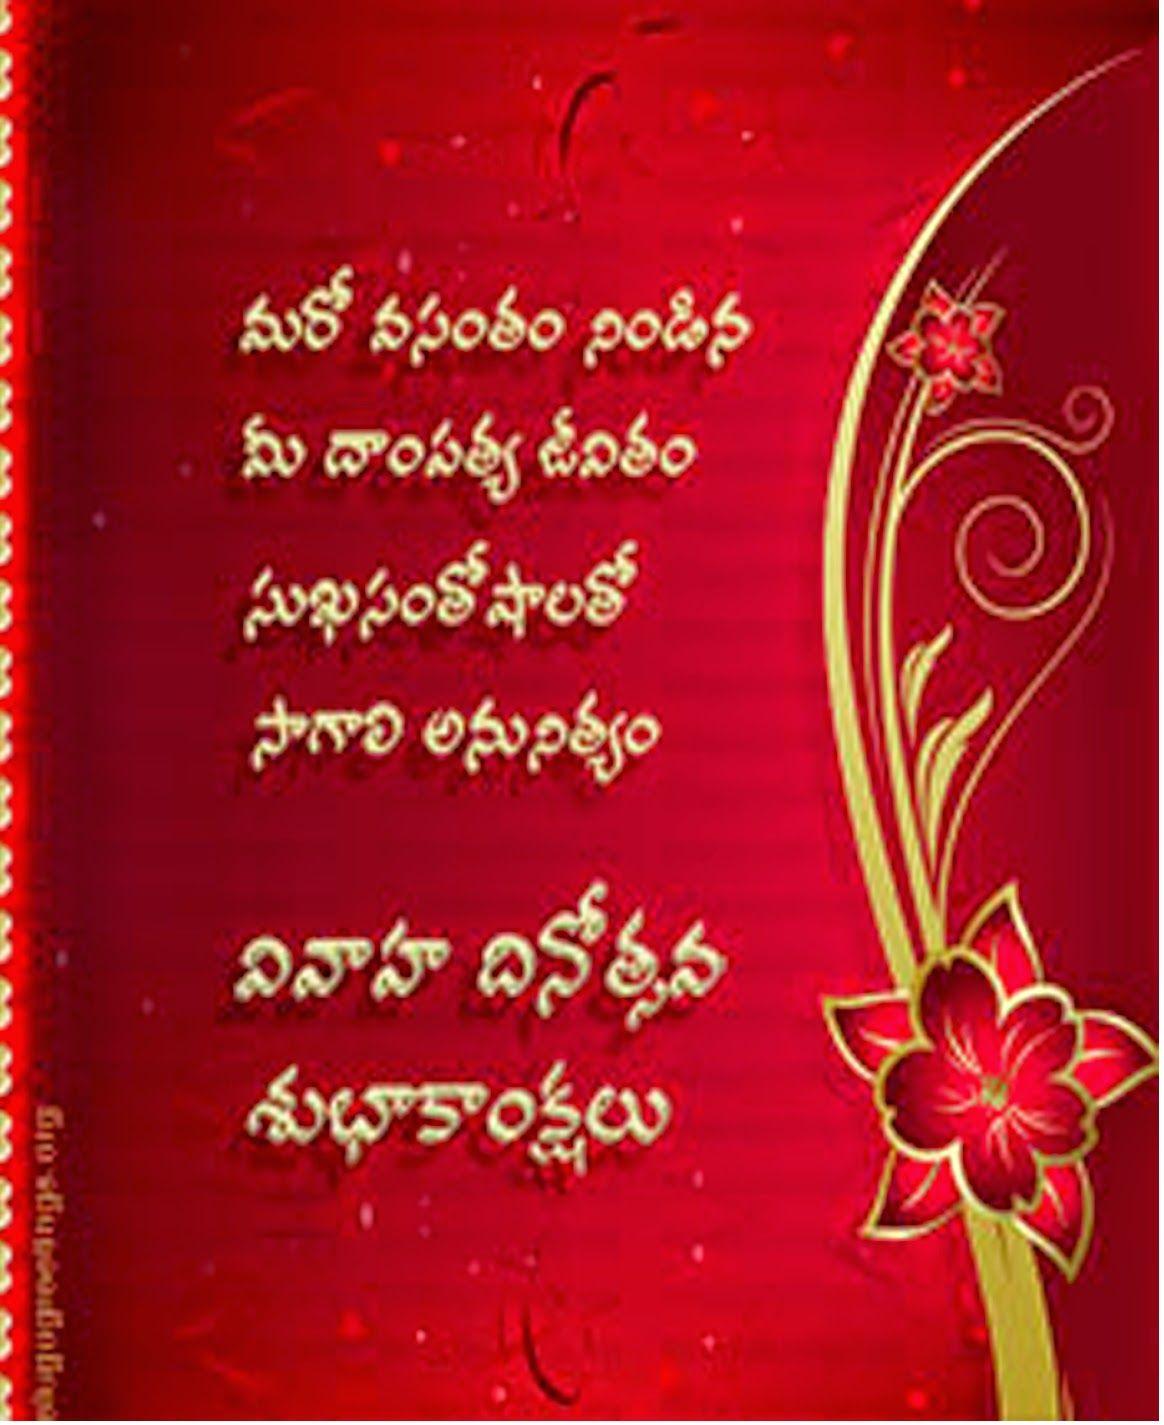 Marriage Day Greeting In Telugu Pelli Roju Subhakanshalu In Telugu